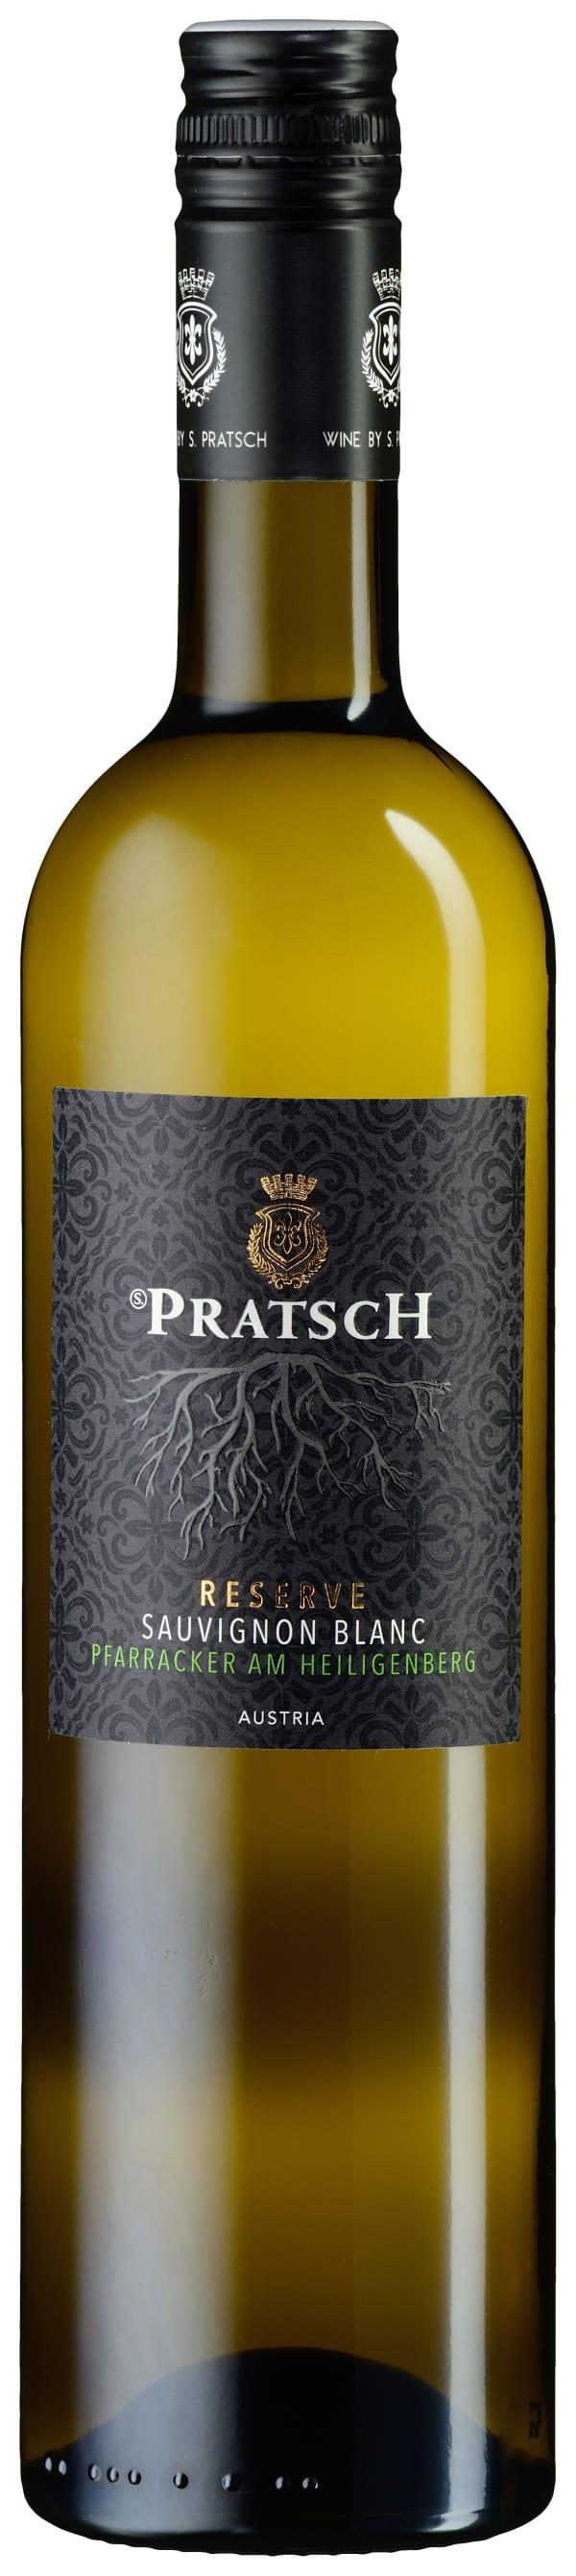 Pratsch Reserve Sauvignon Blanc 2012